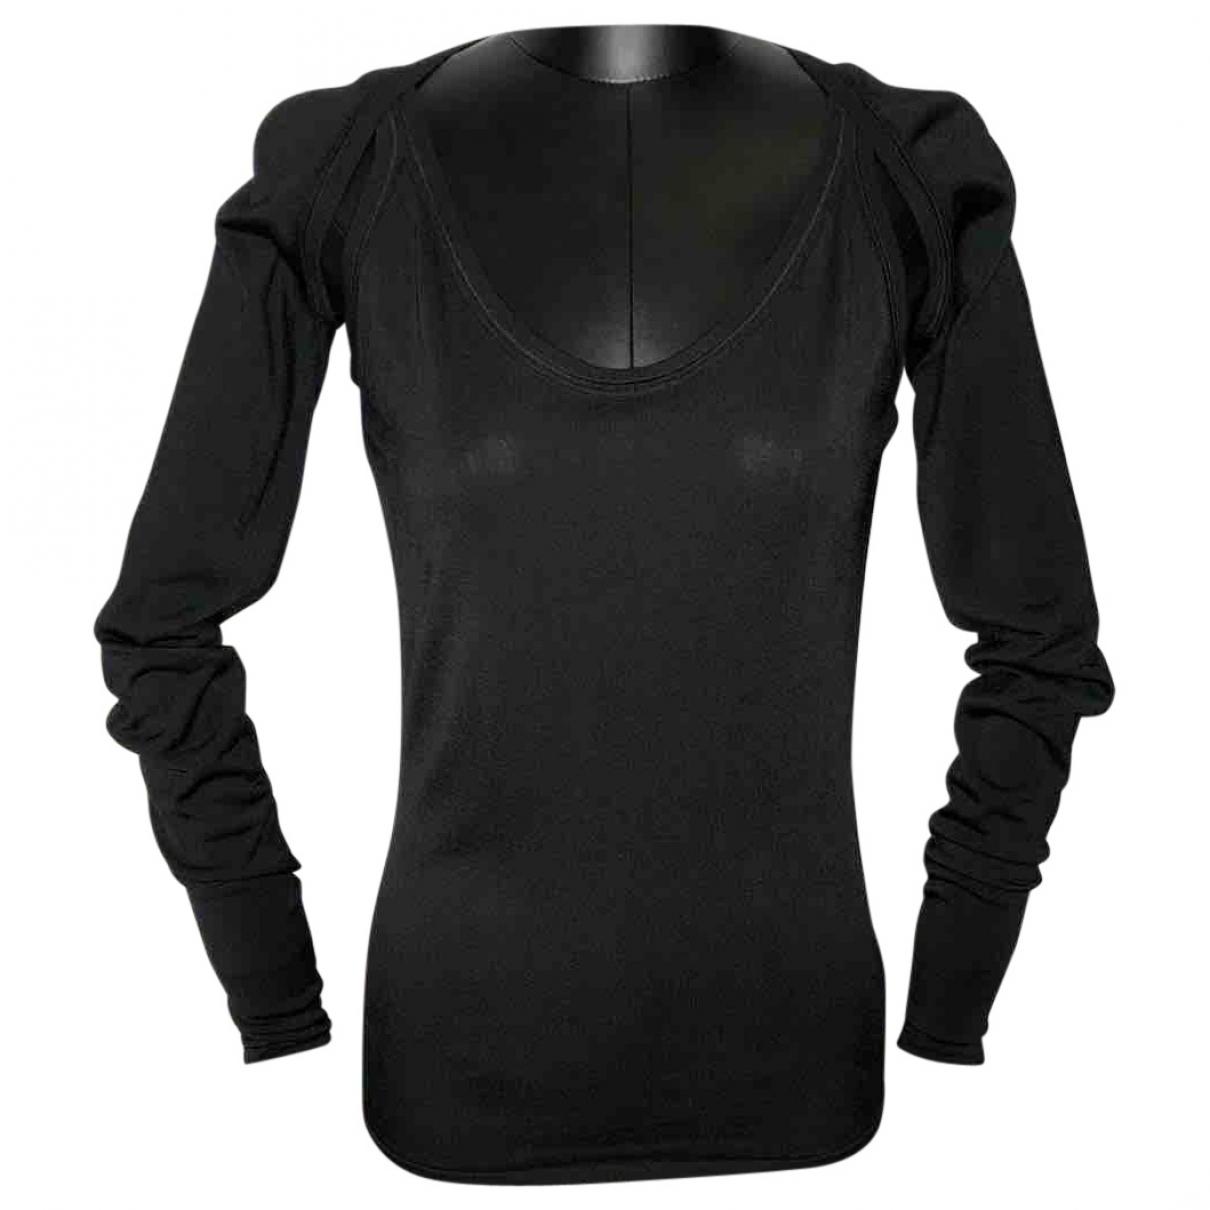 Gucci \N Black  top for Women S International